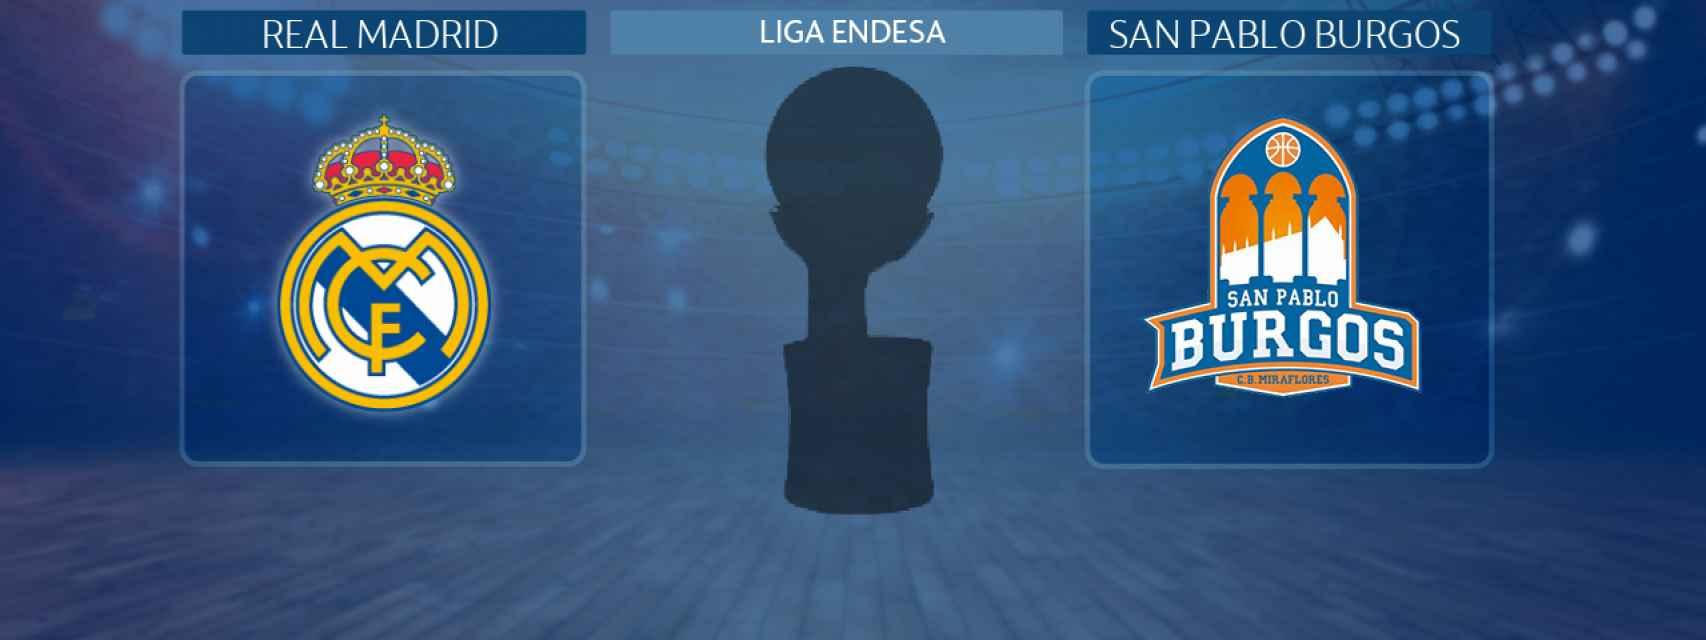 Real Madrid - San Pablo Burgos, partido de la Liga Endesa